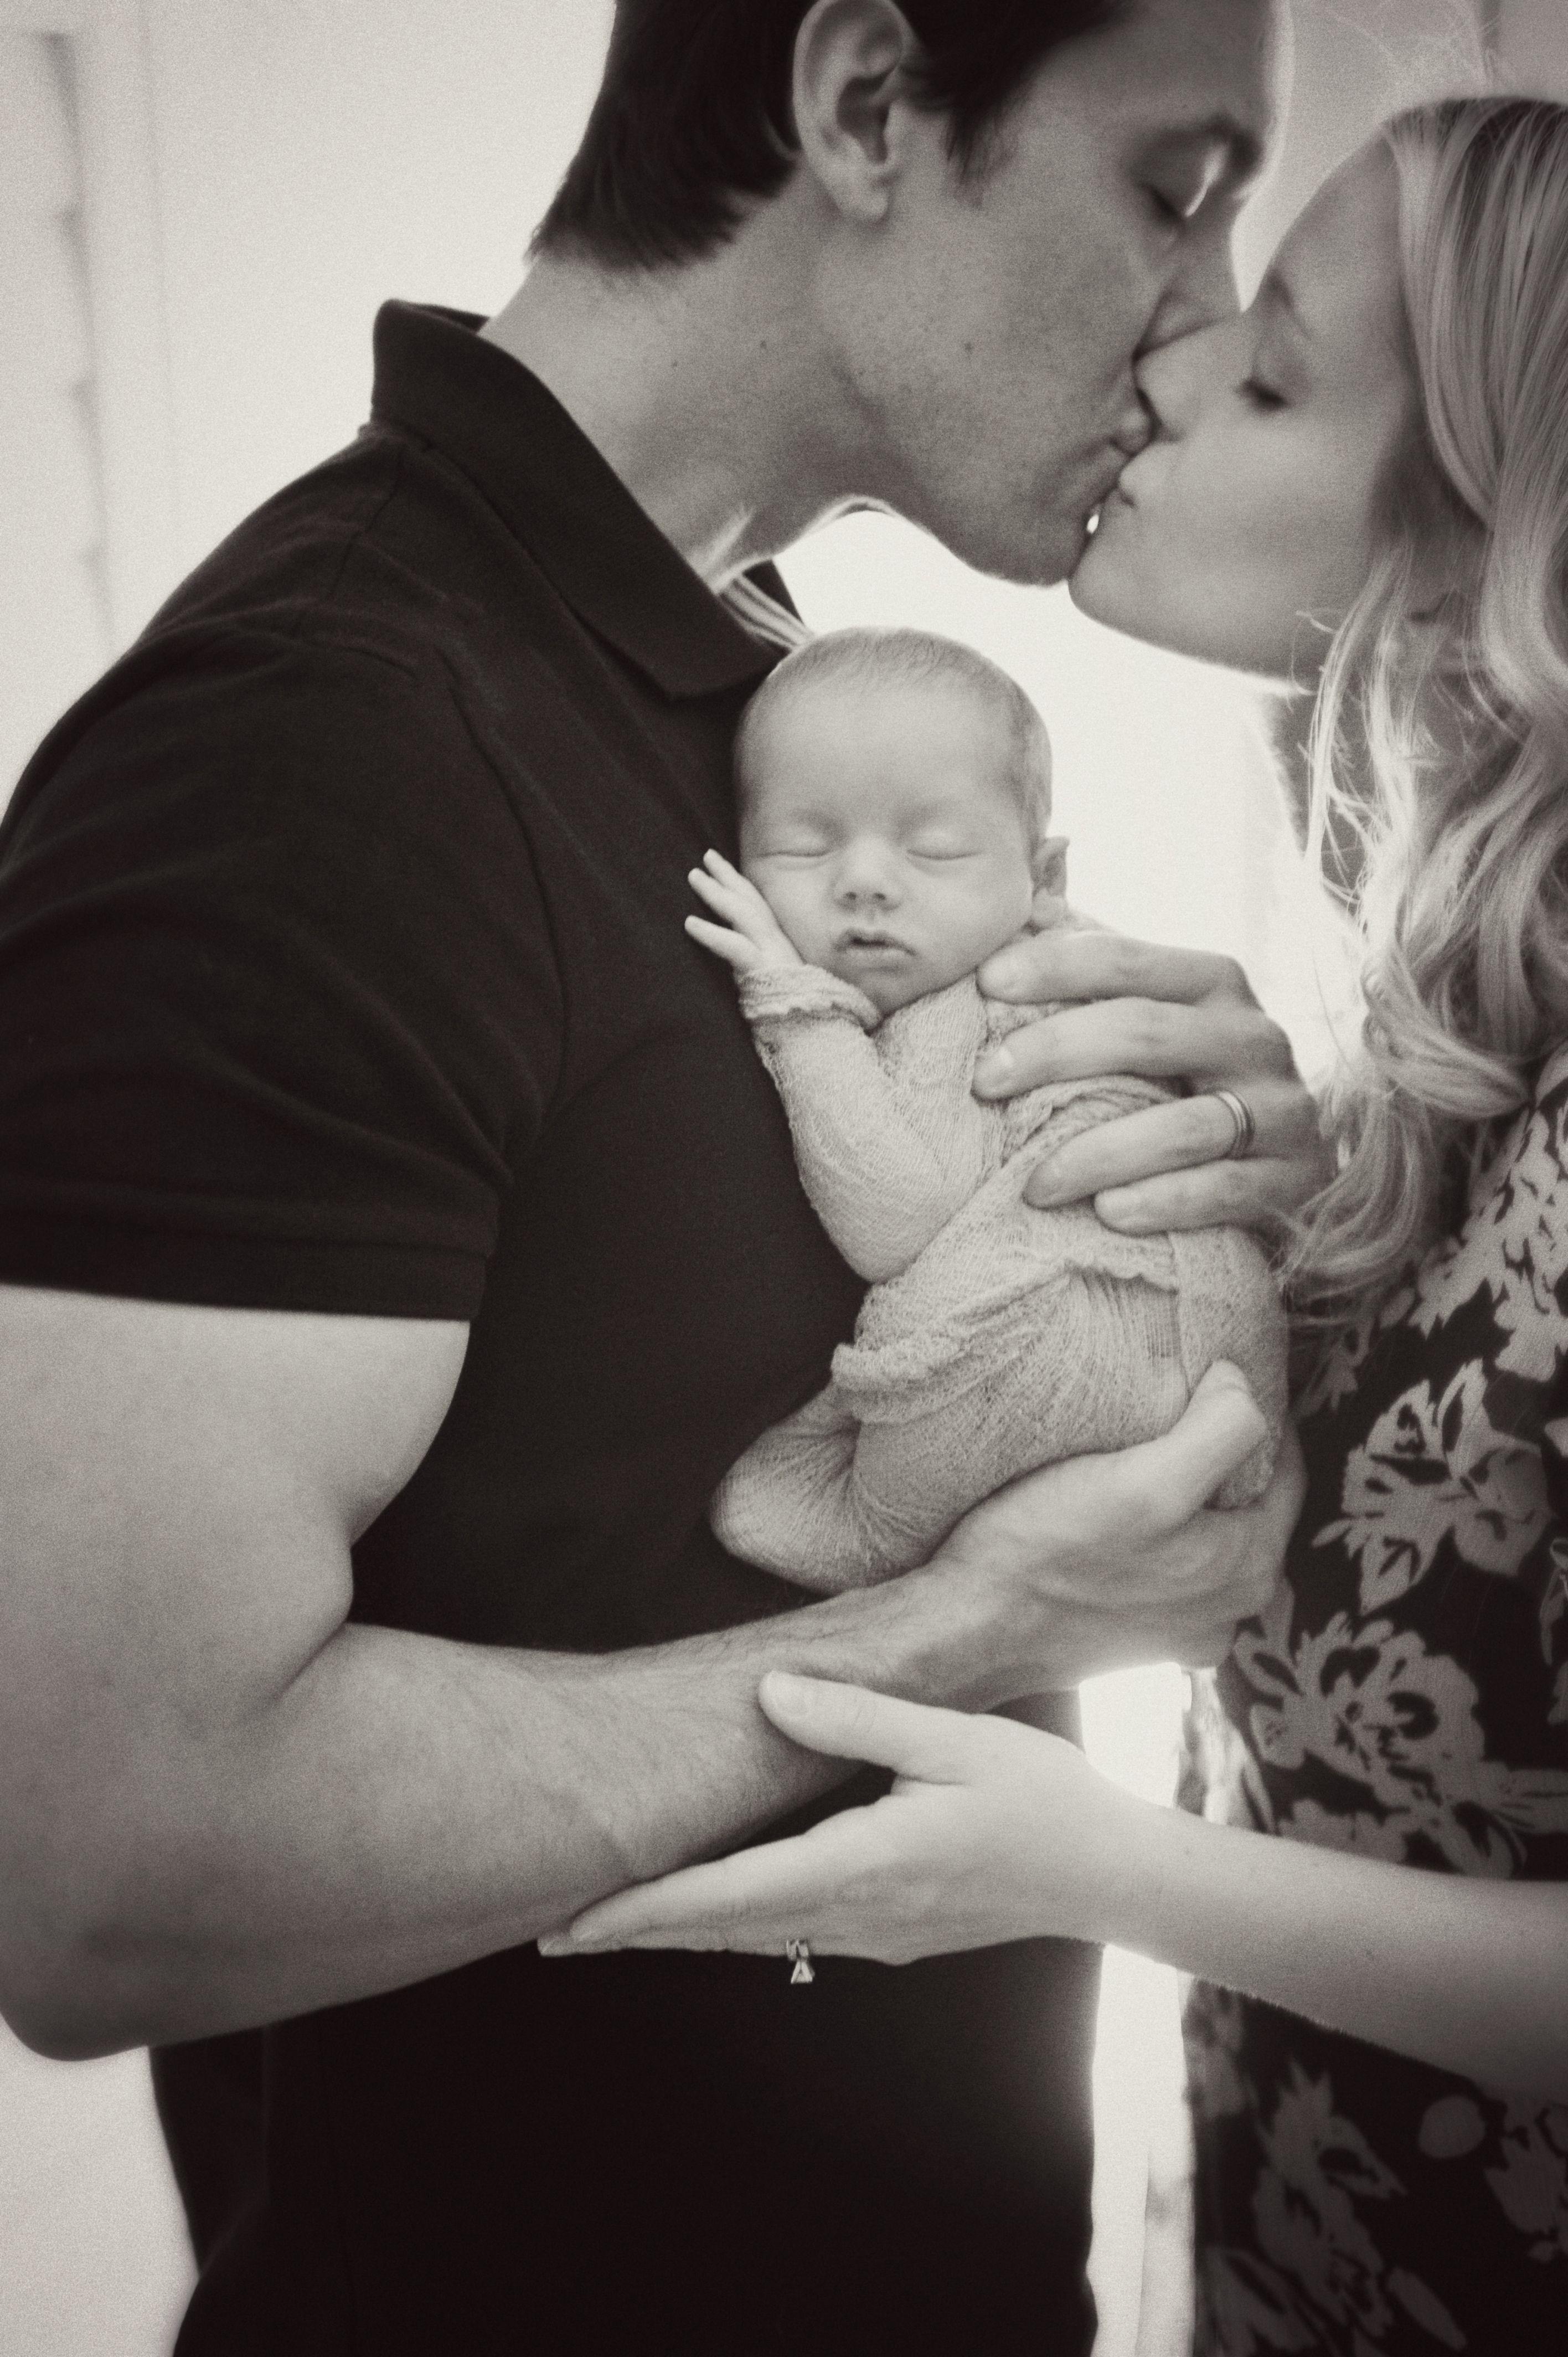 Newborn photography pose ideas 87 newborn shoot newborn poses newborn baby photography family